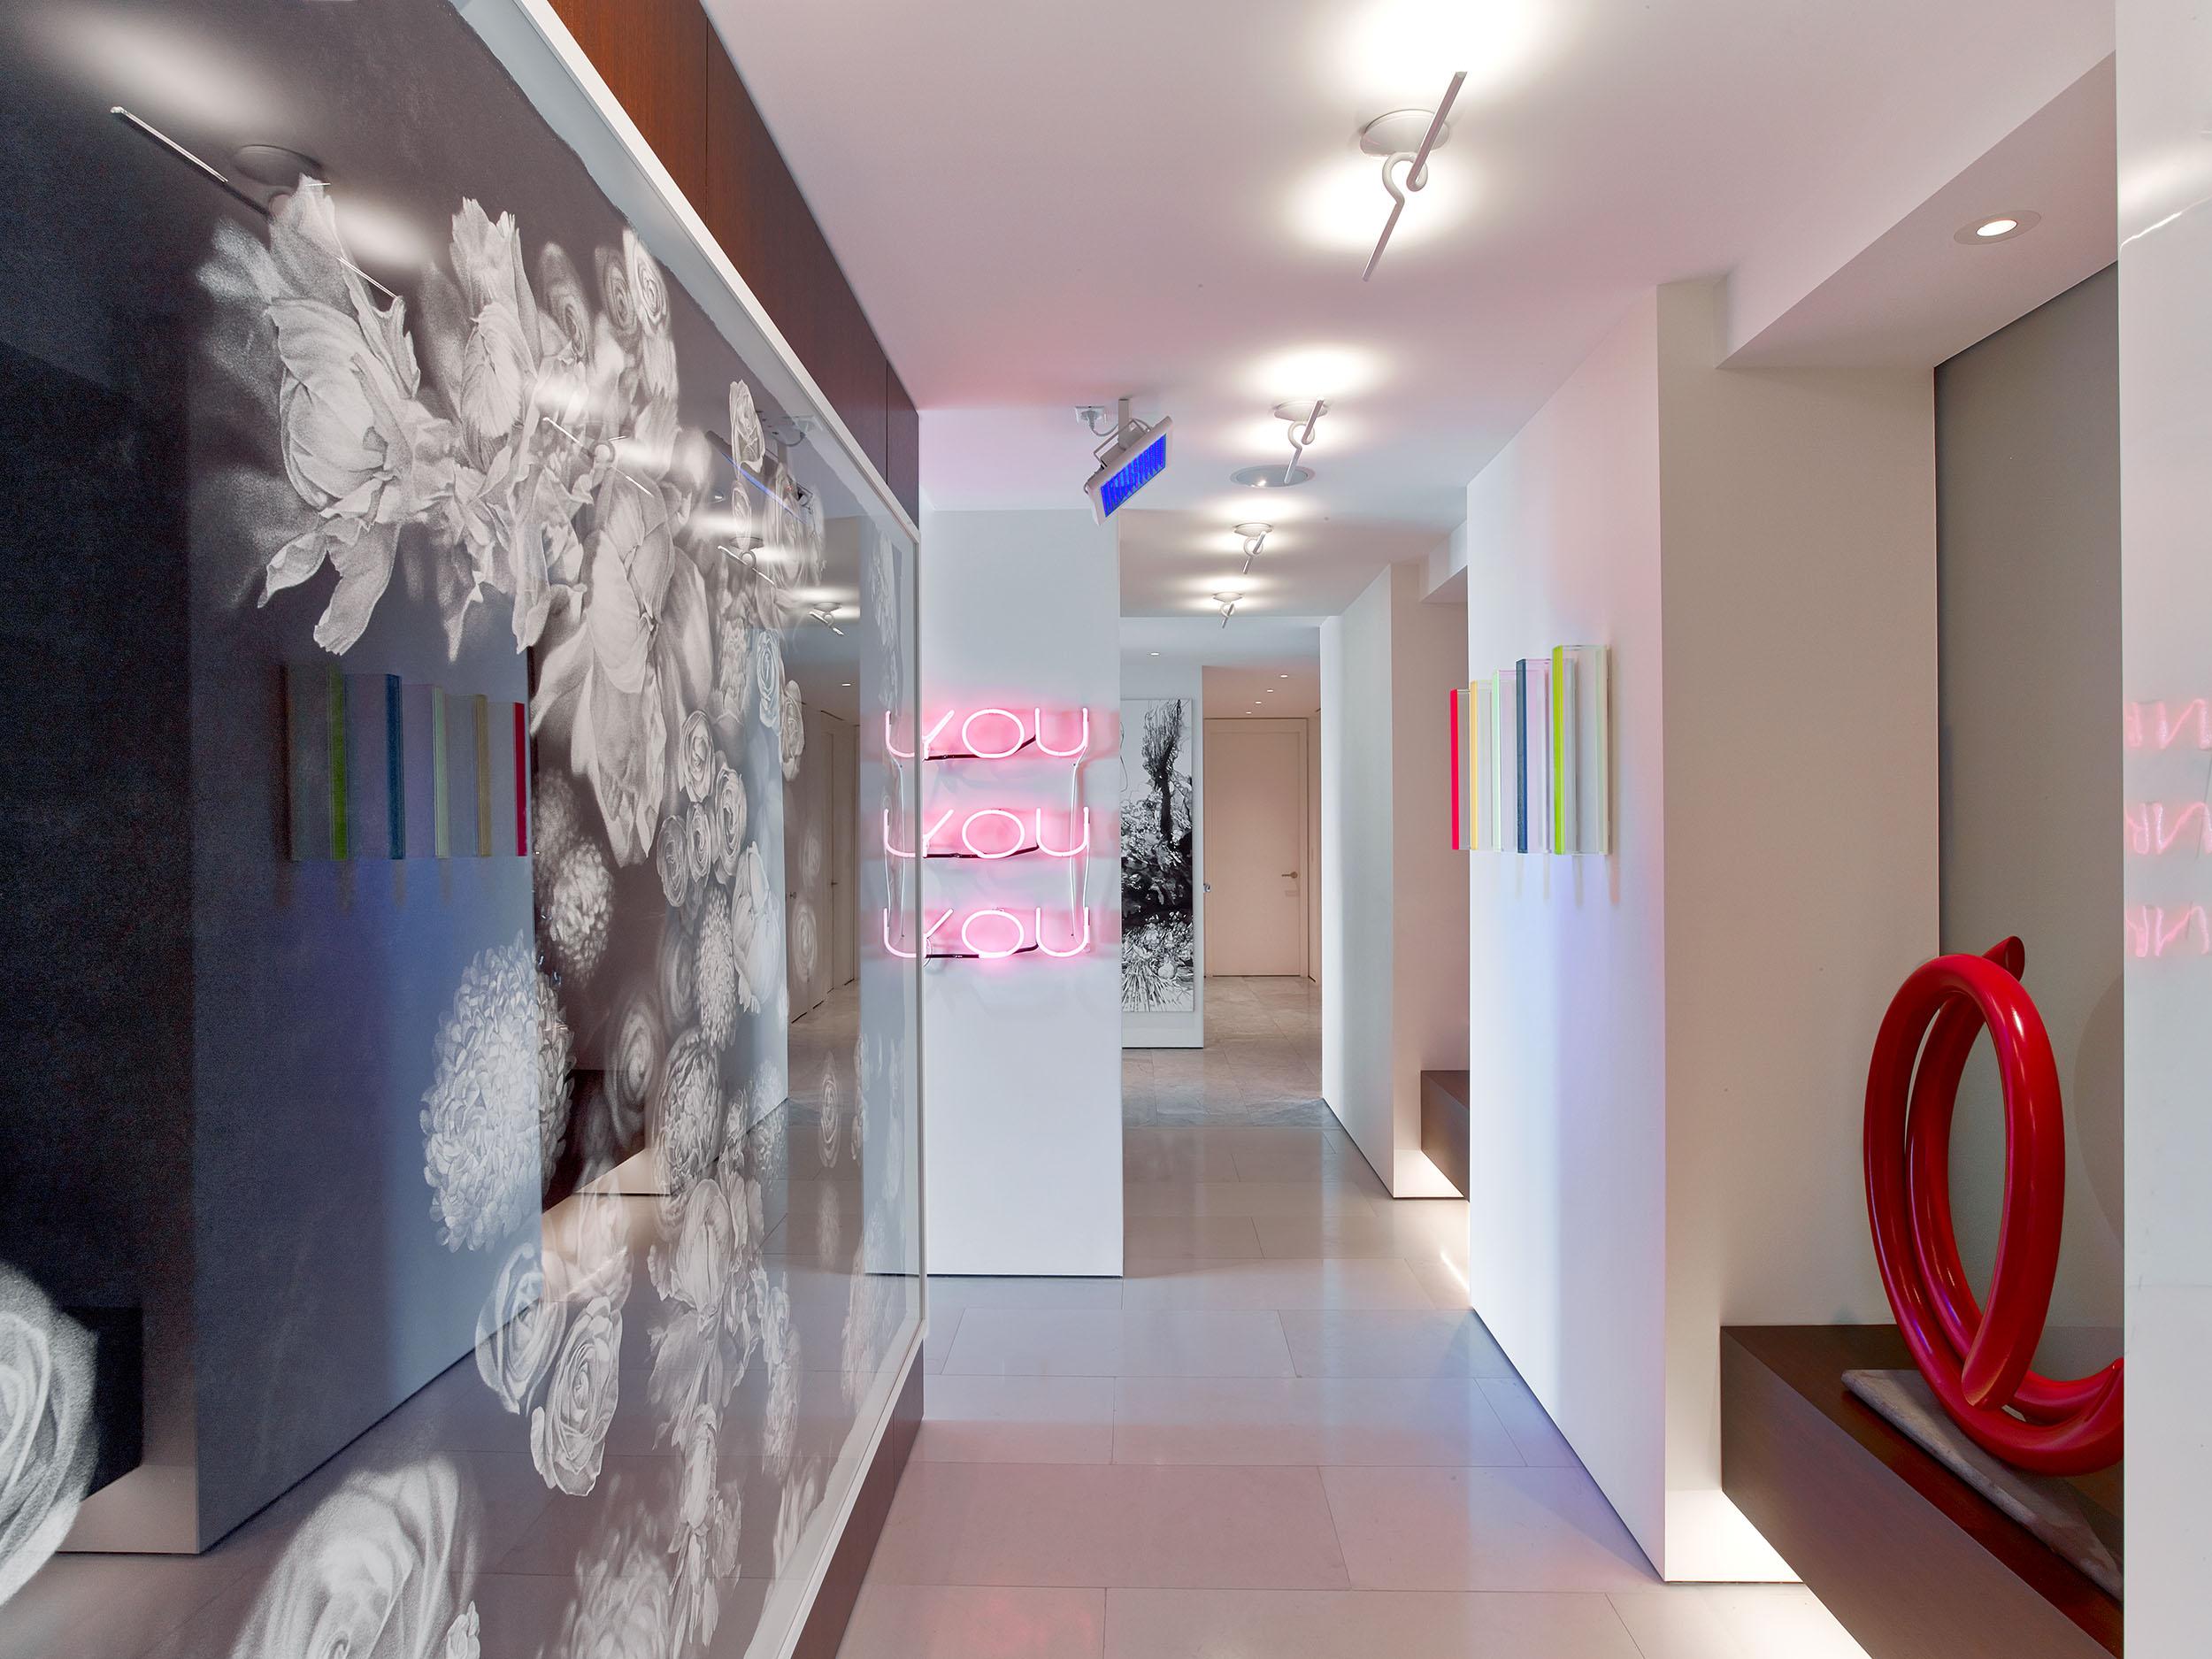 Architecture & Interior Design: Hariri & Hariri  Photography - Eric Laignel & Courtesy of - Hariri & Hariri Architecture